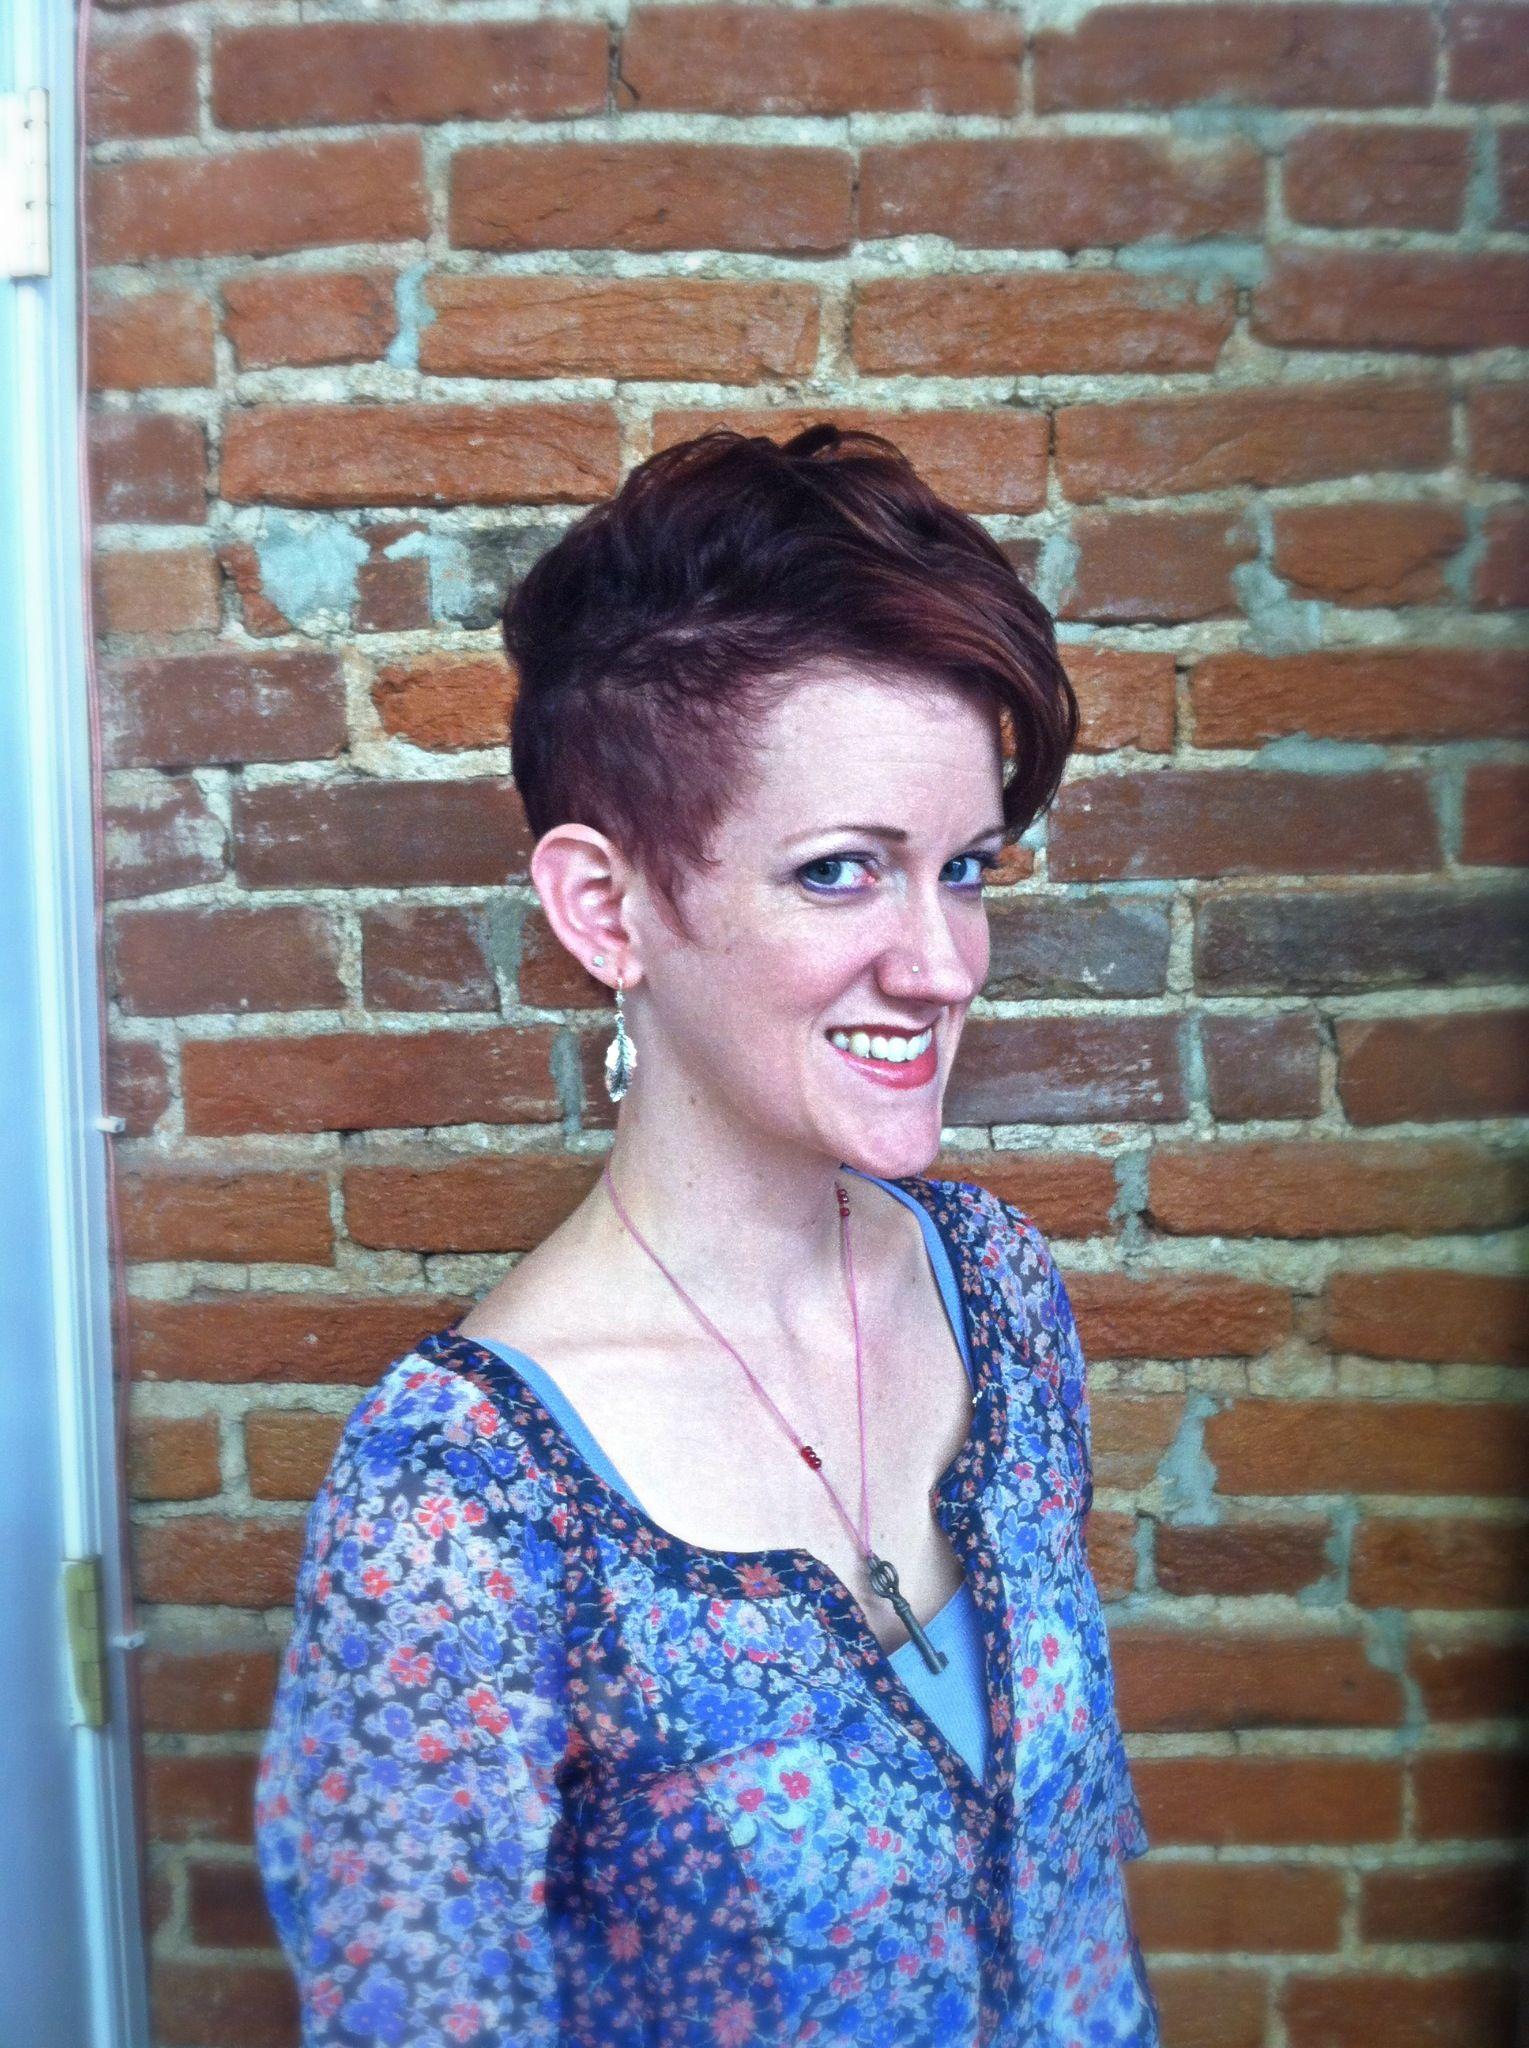 Short womenus hair cutshorthairsassyhairredhairbalncehairspa